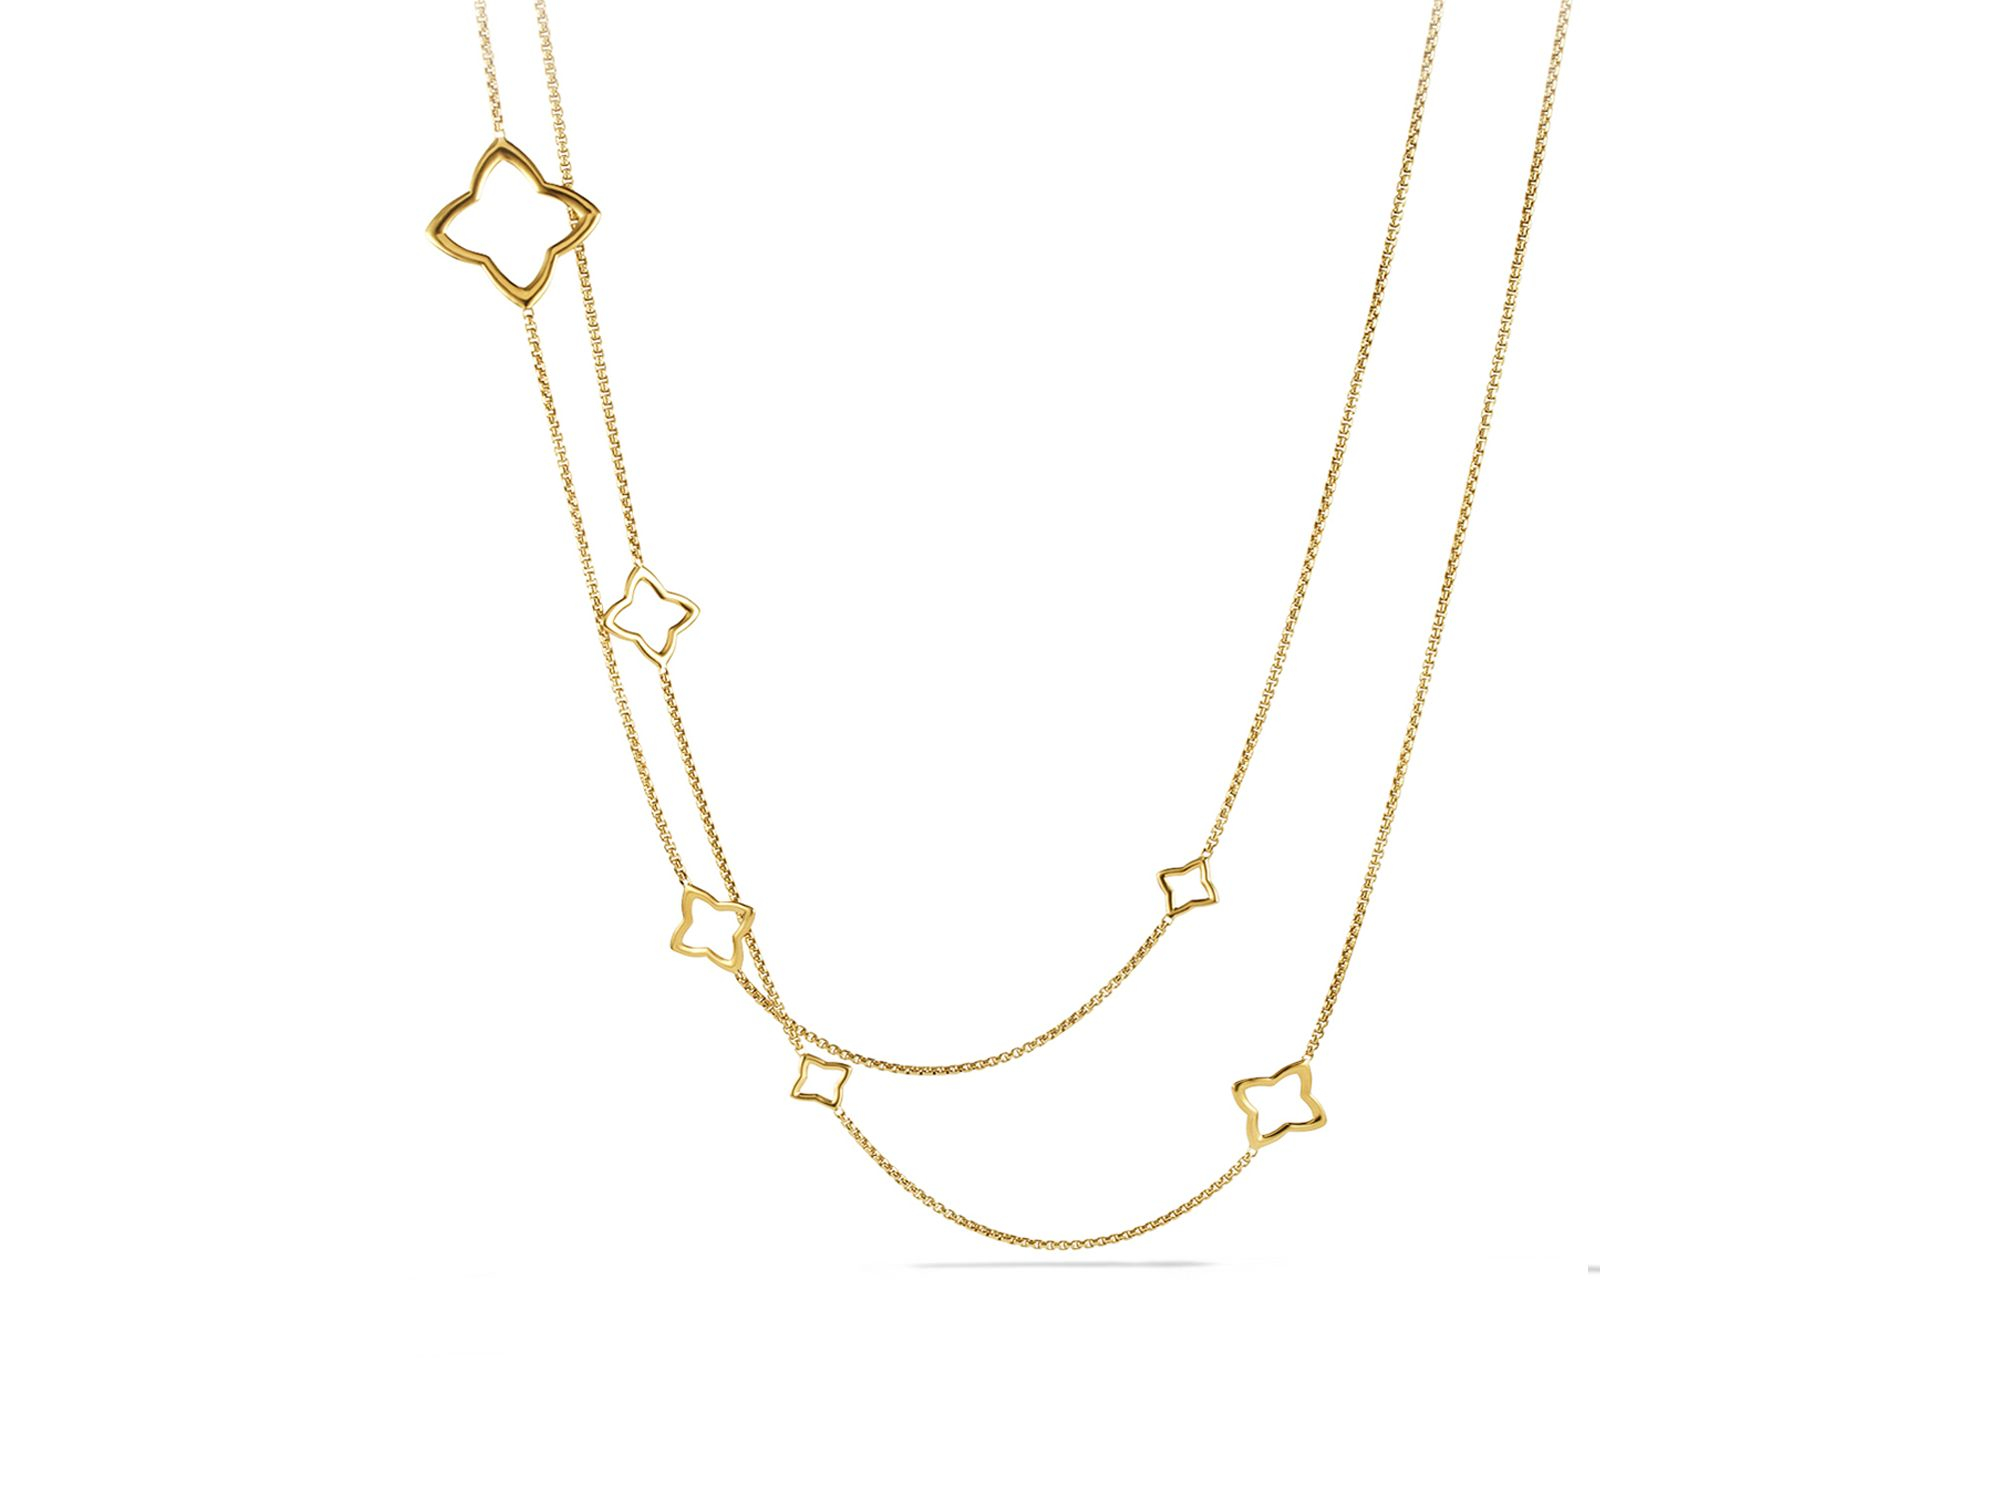 Lyst david yurman quatrefoil chain necklace in yellow gallery aloadofball Choice Image